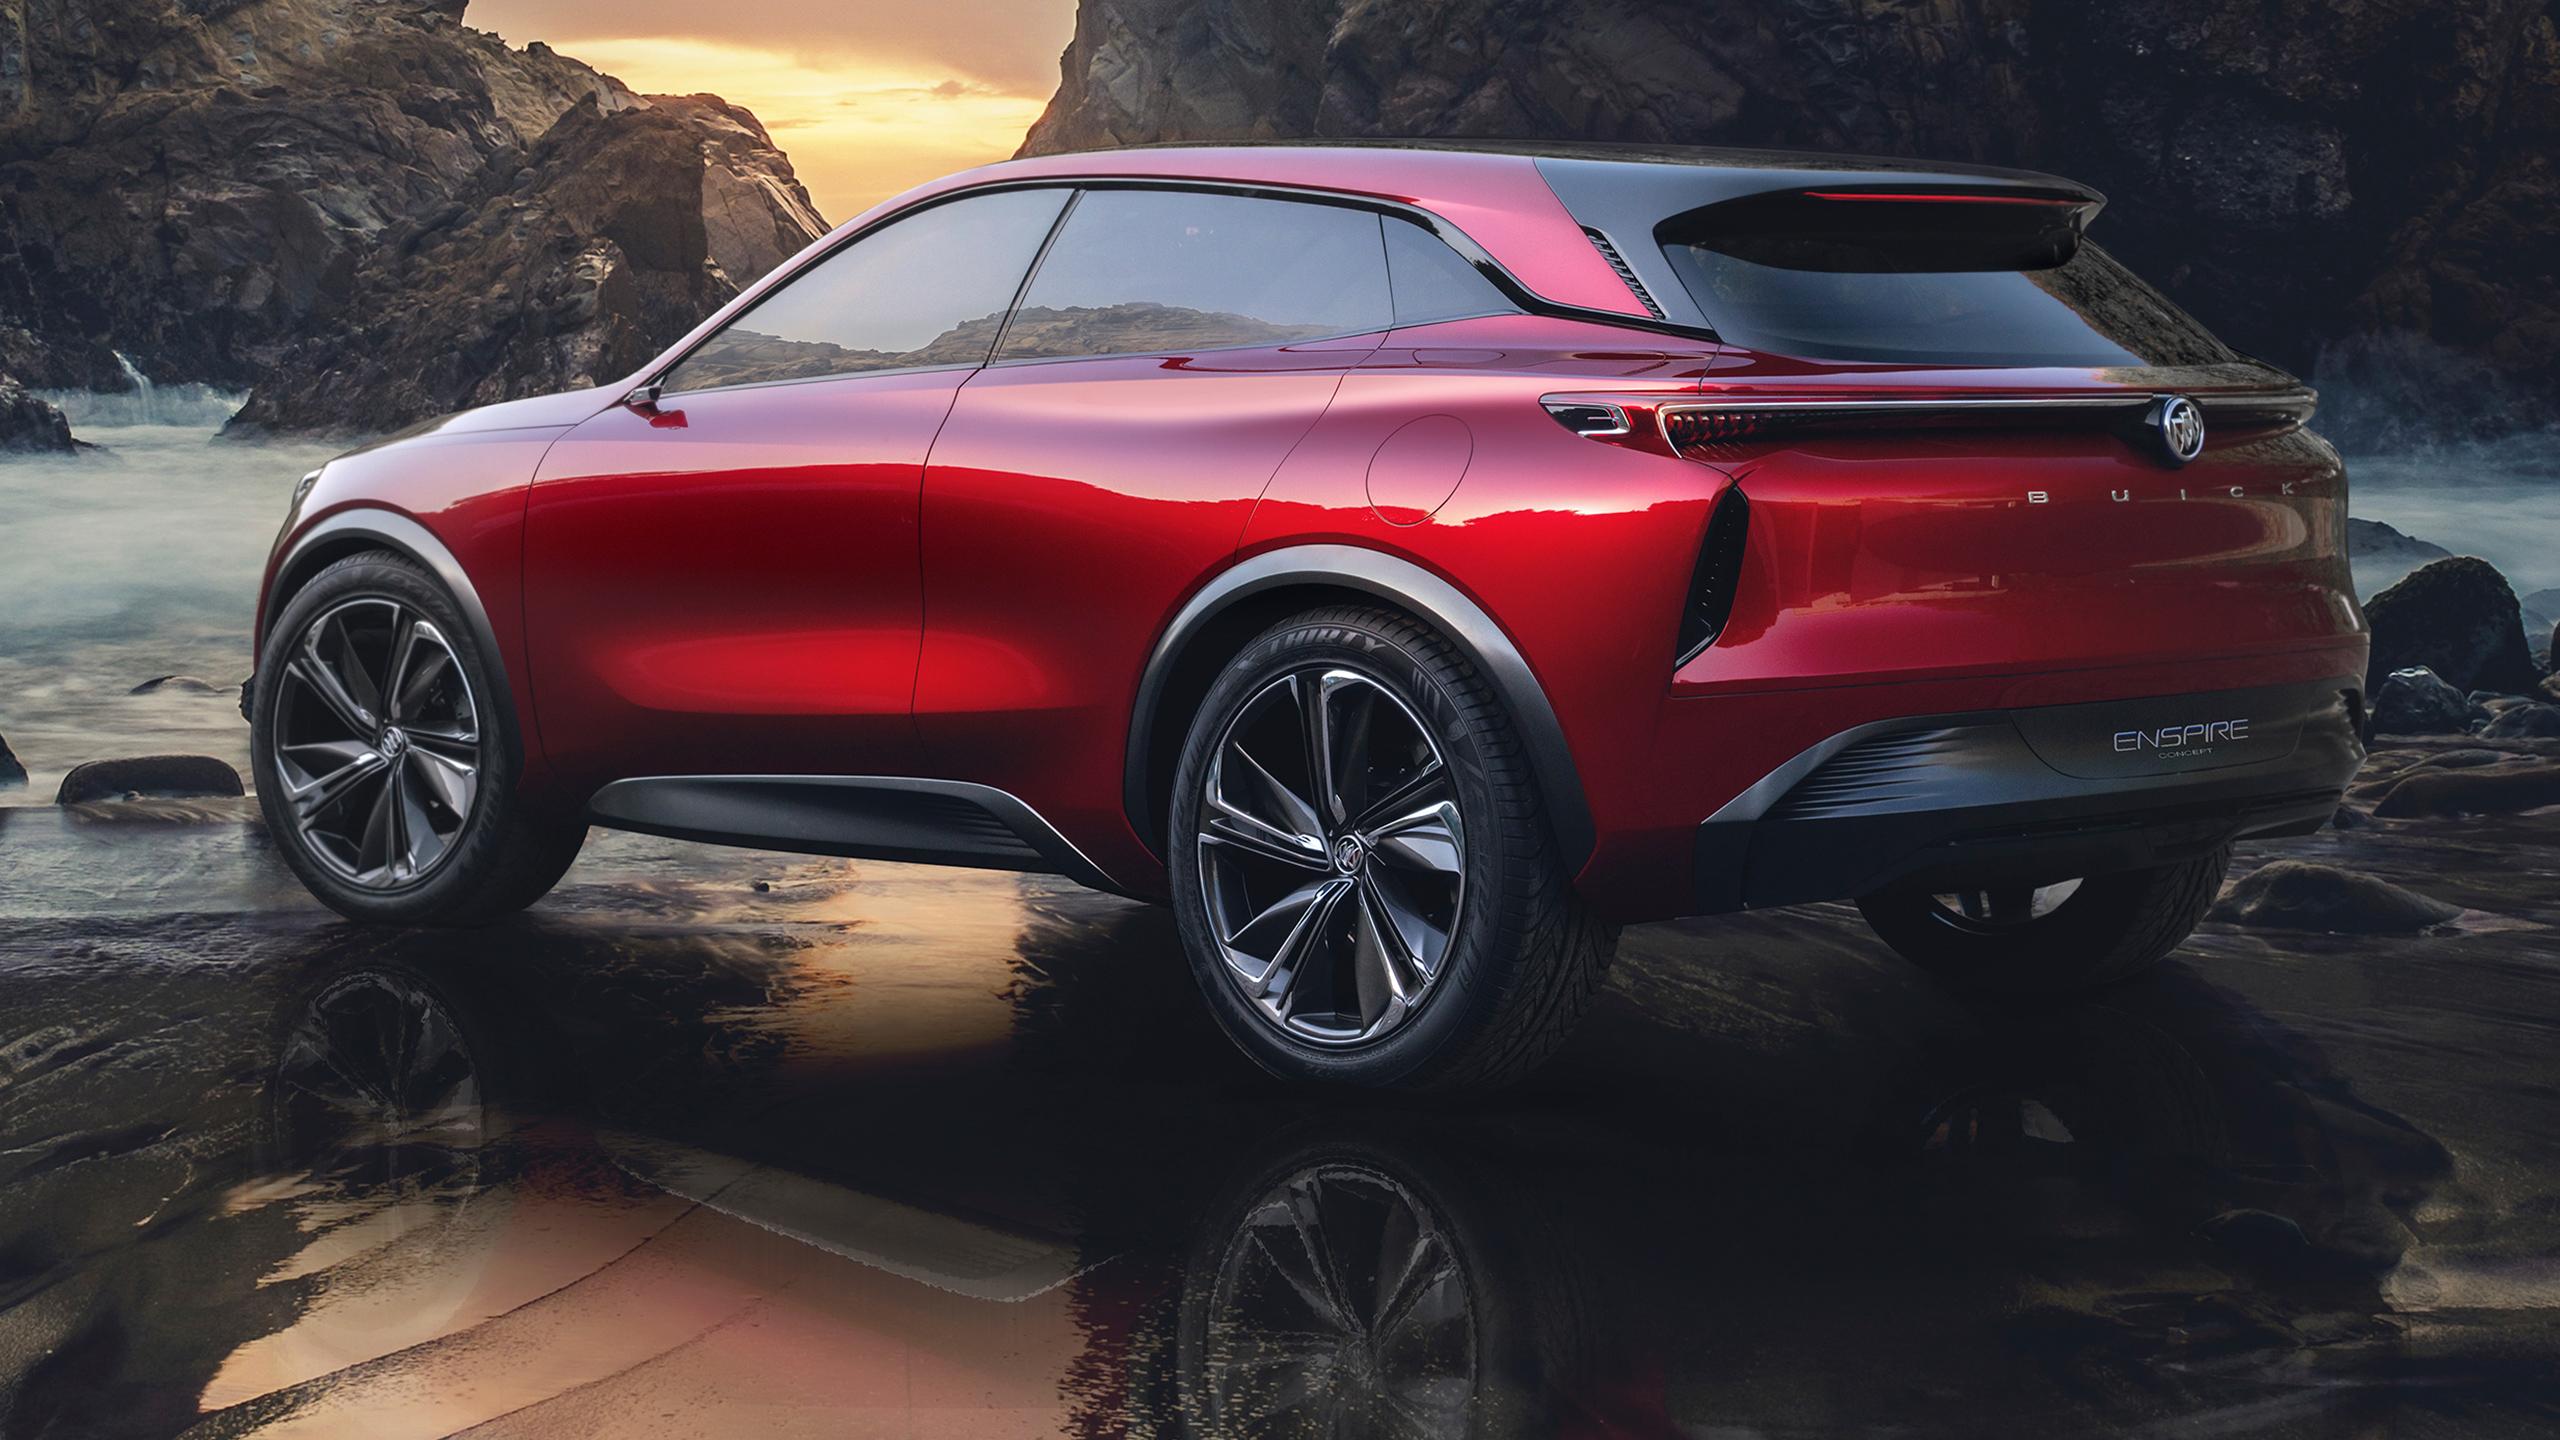 2018 Buick Enspire 2 Wallpaper | HD Car Wallpapers | ID #10162